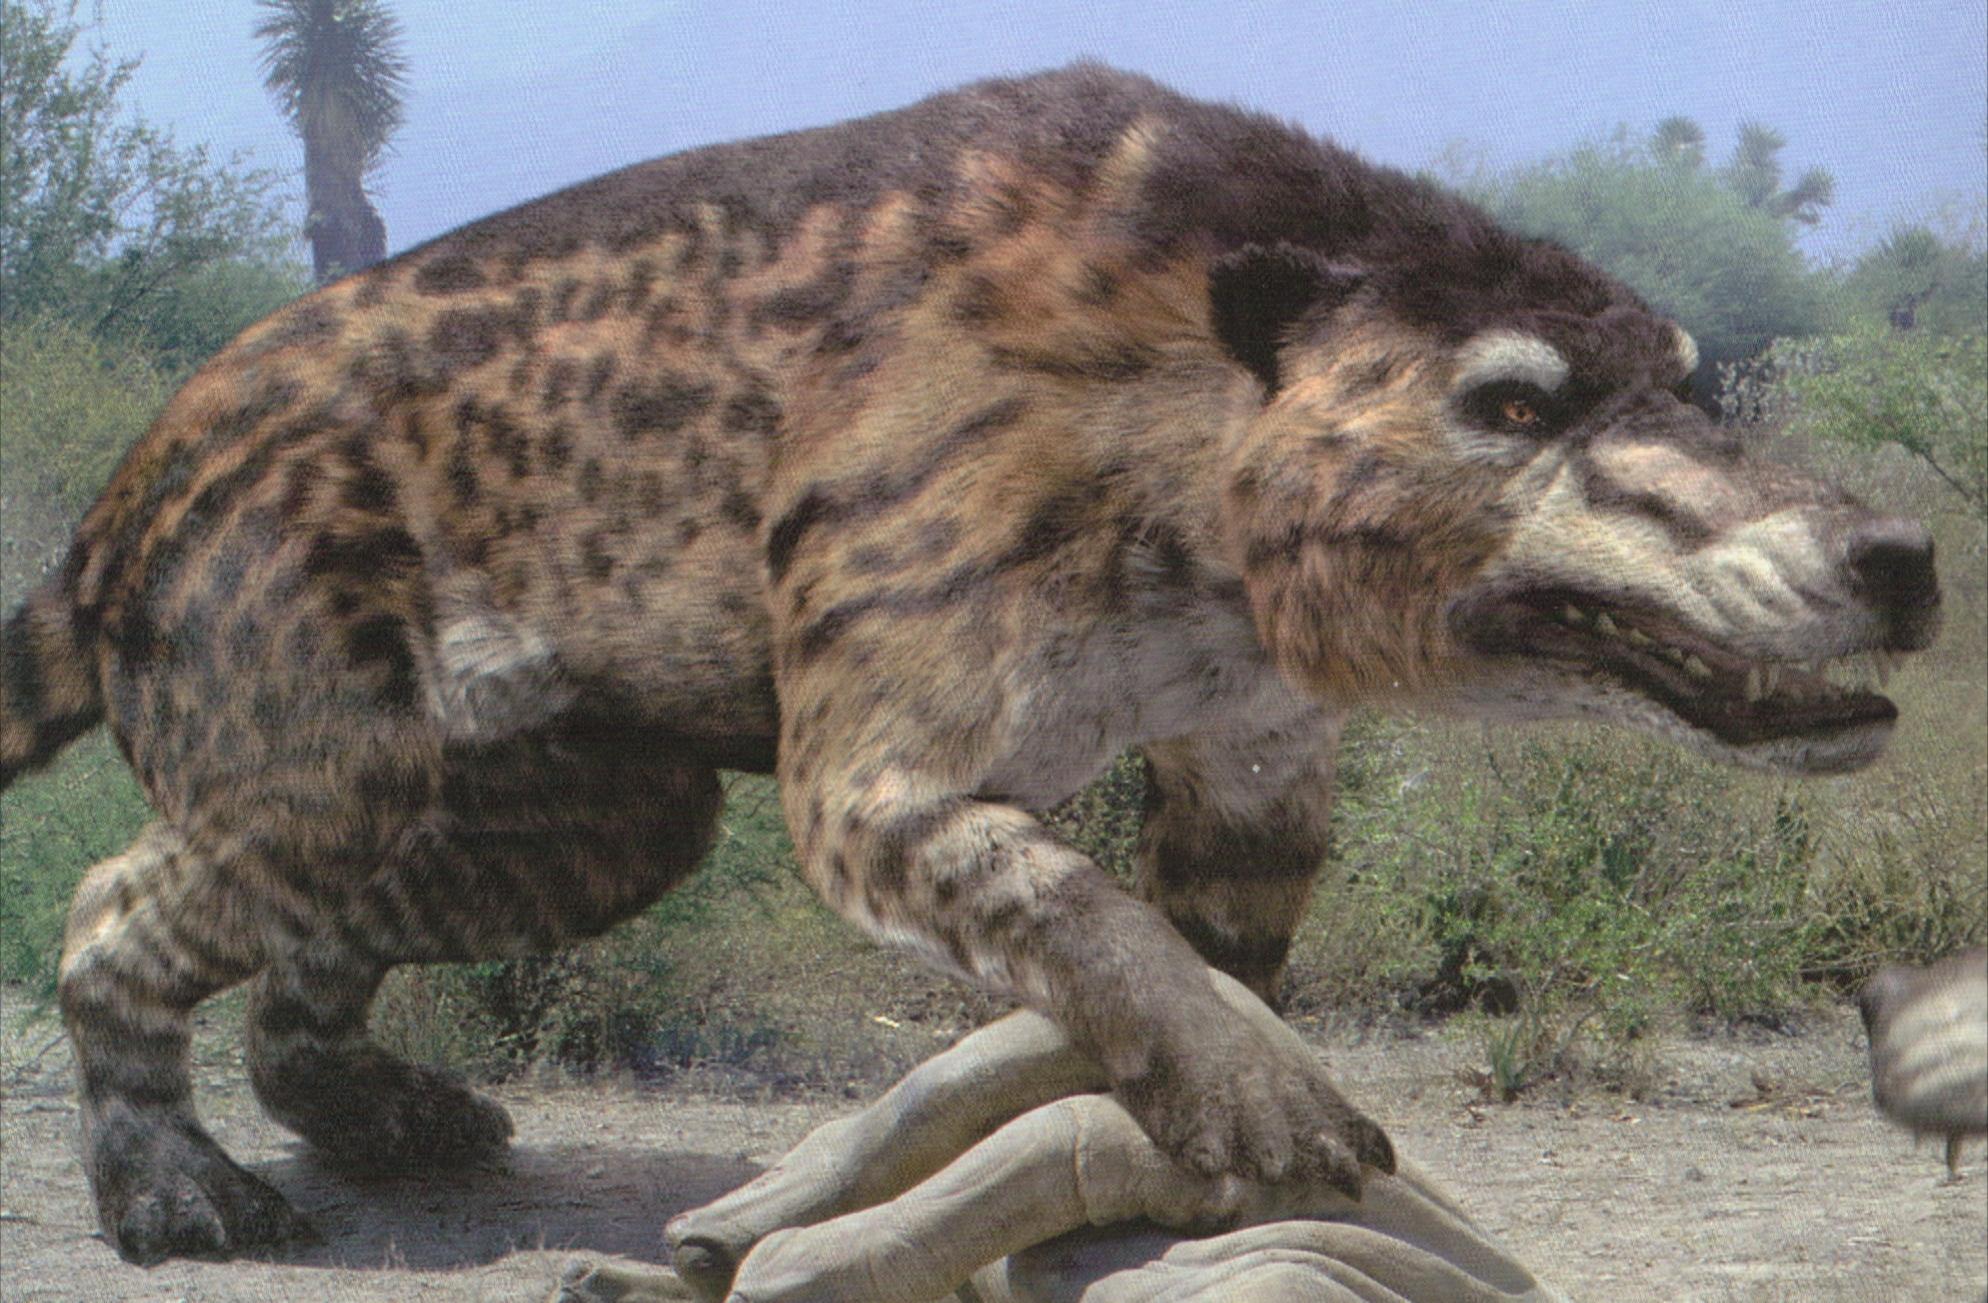 Muranthosarchus